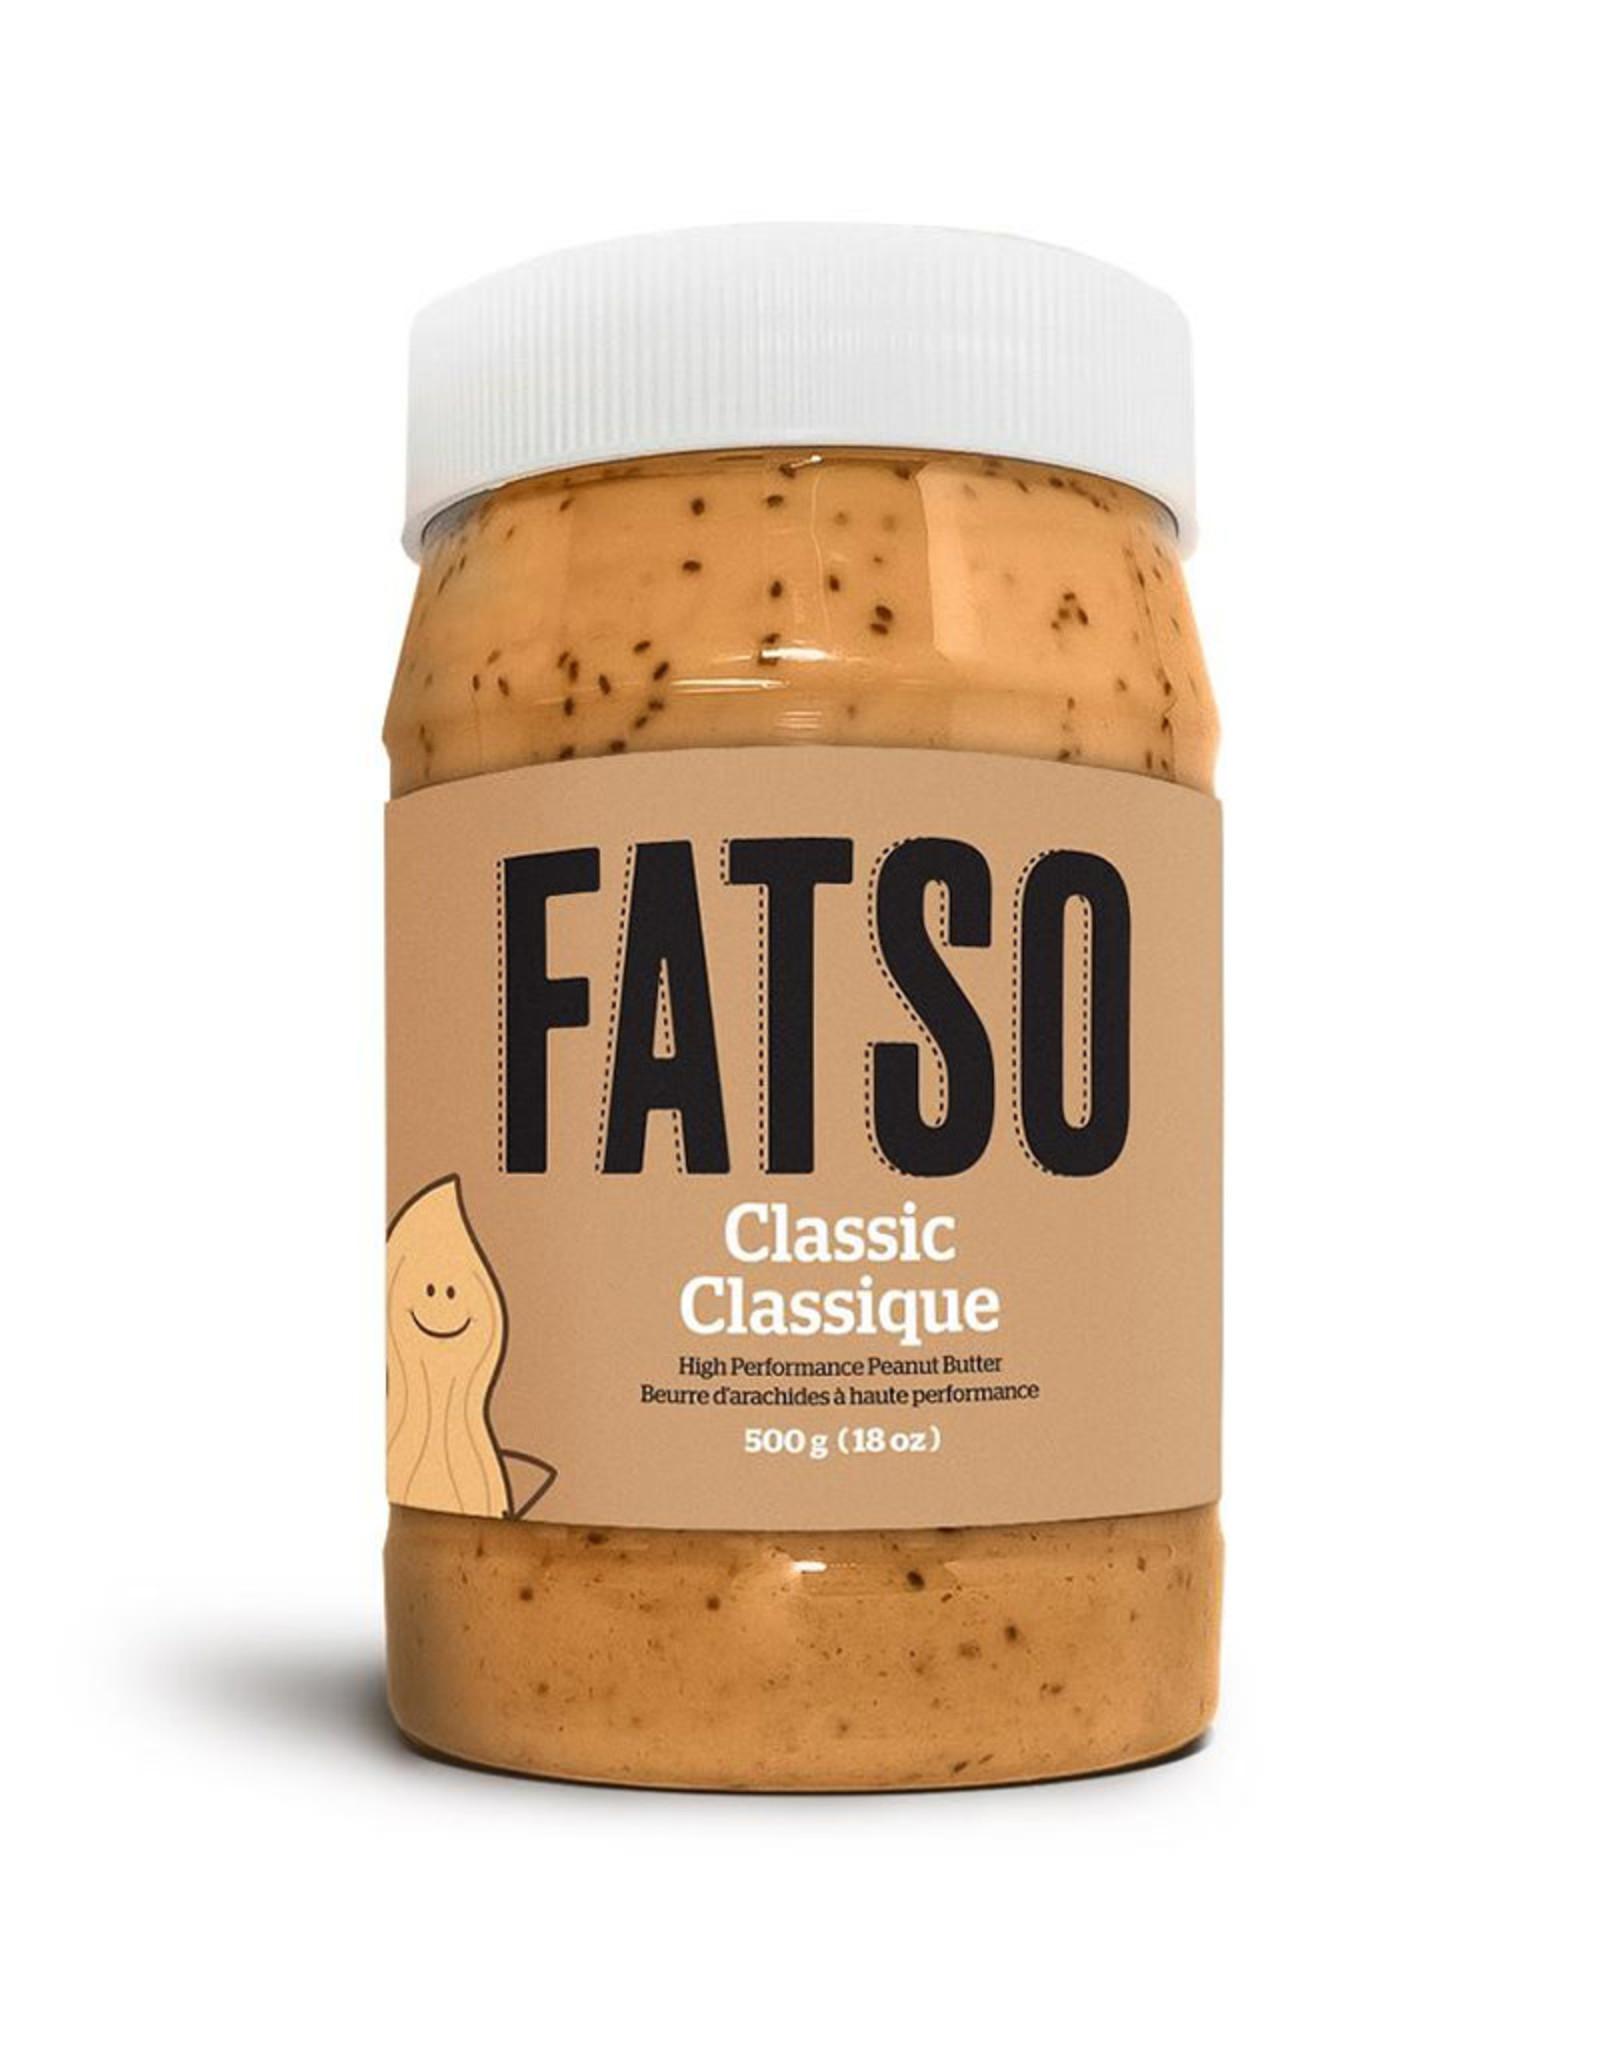 Fatso Fatso - Peanut Butter, Original